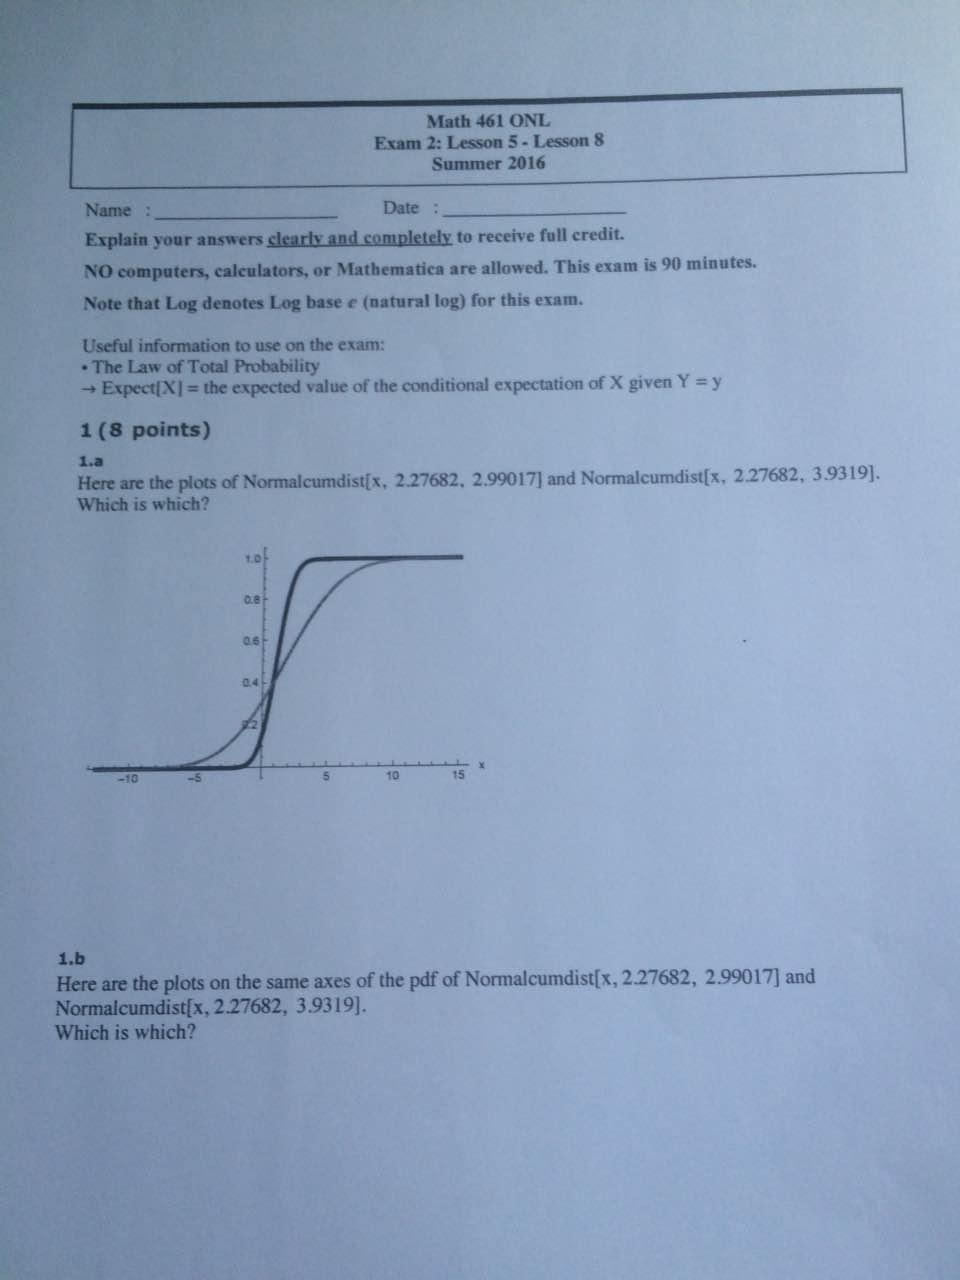 Solved: Math 461 ONL Exam 2: Lesson 5- Lesson 8 Summer 201 ...